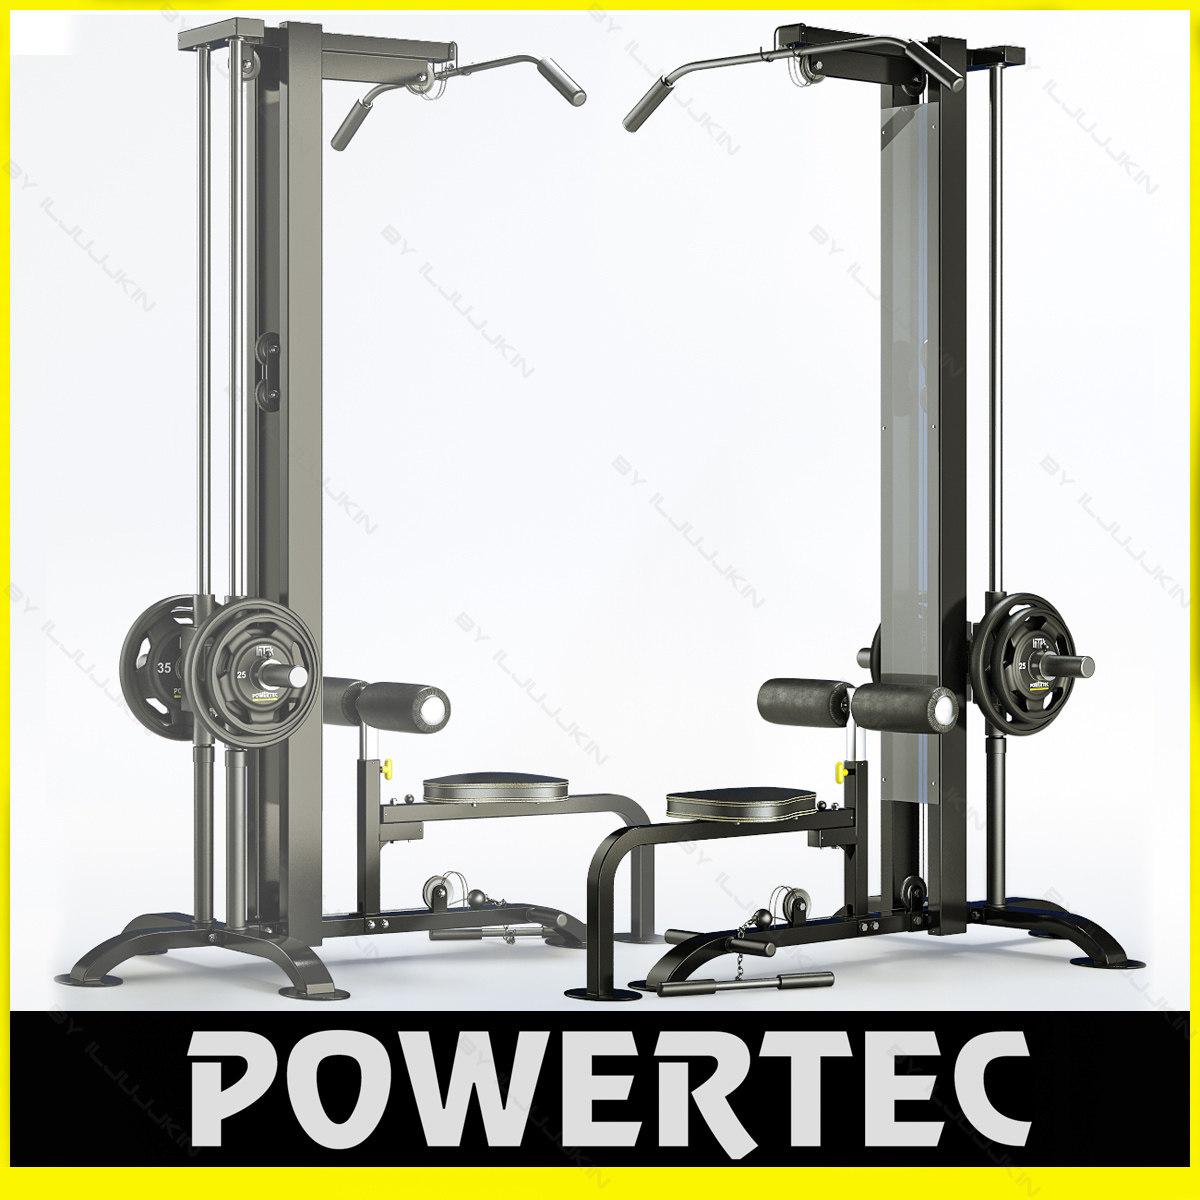 powertec machine